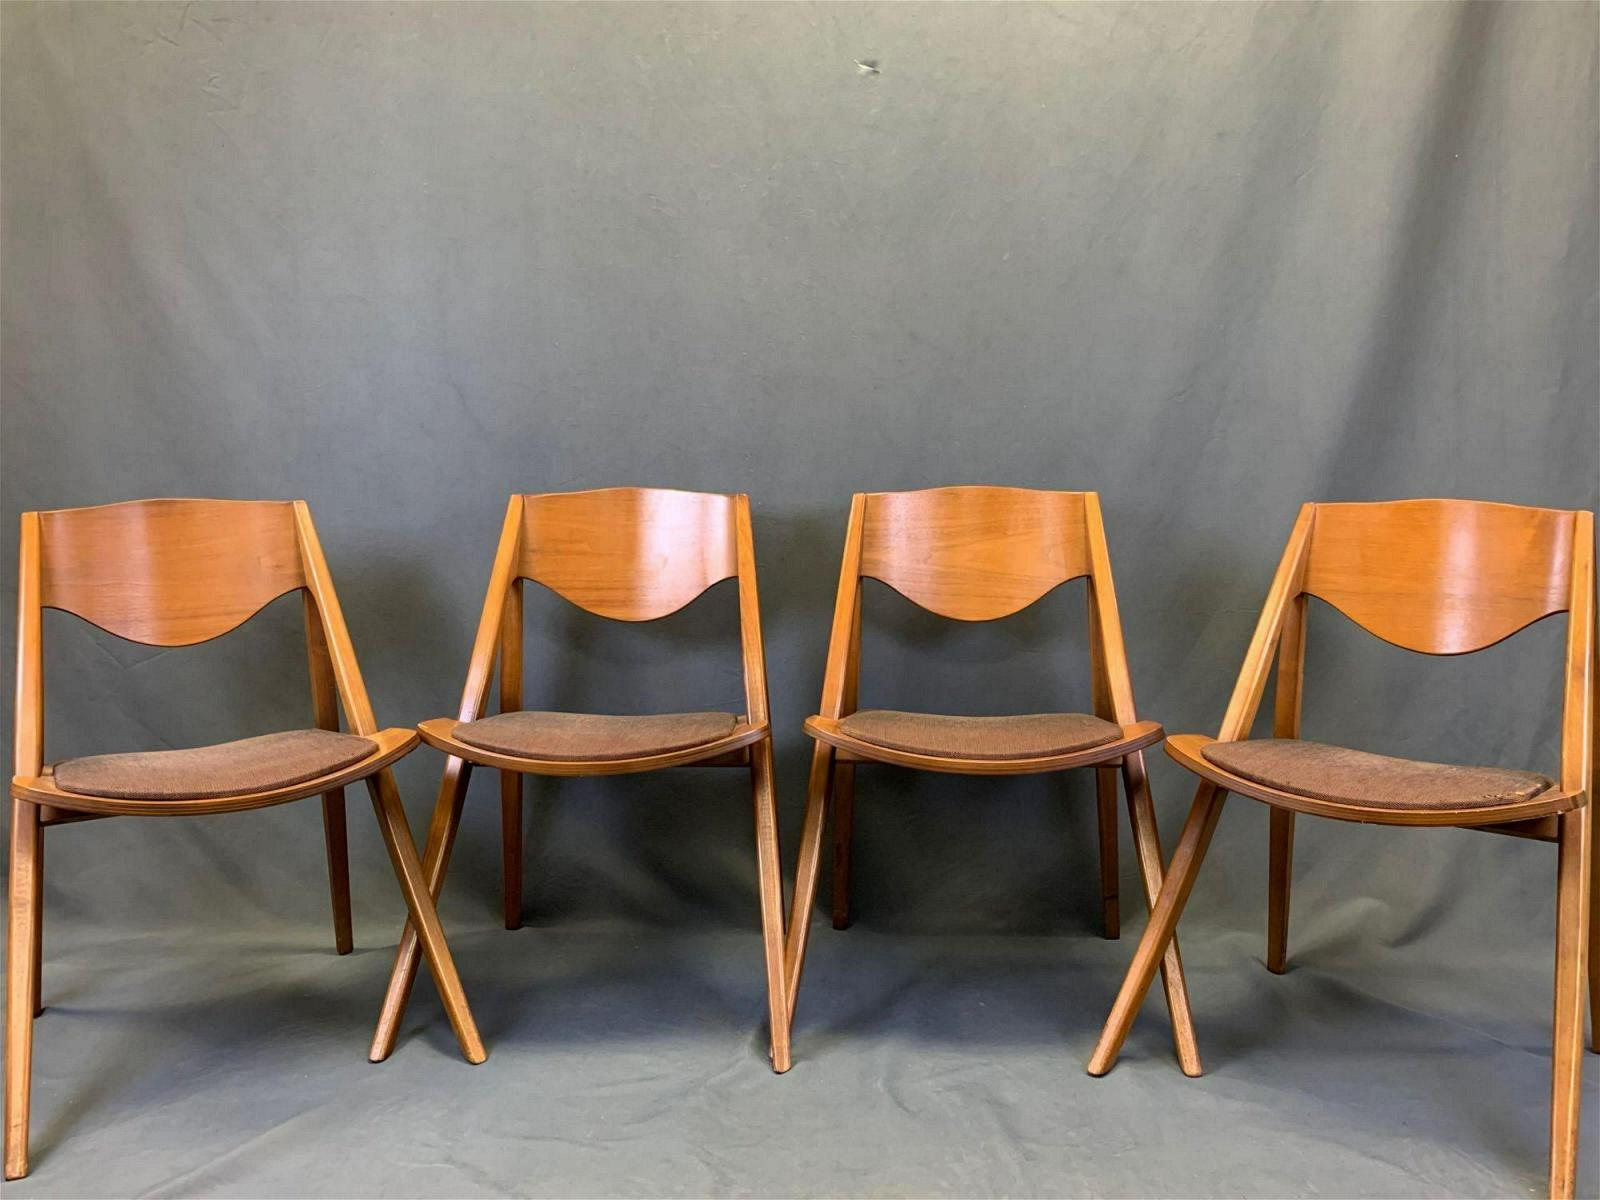 Four American Mid Century Modern Walnut Chairs